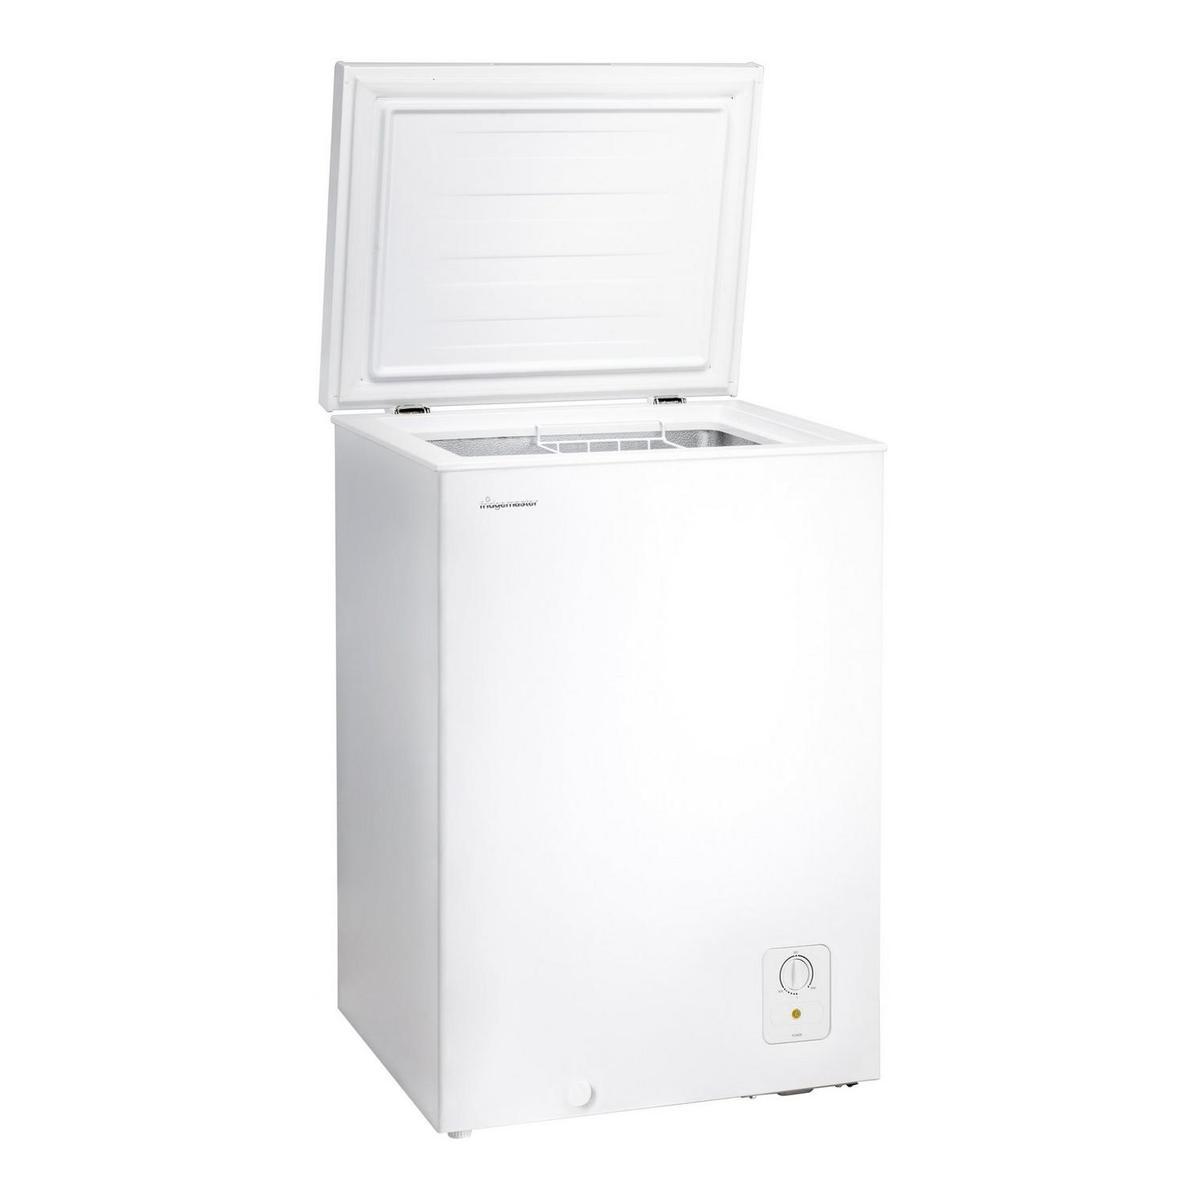 Fridgemaster MCF96 A+ 55cm Static Chest Freezer, White